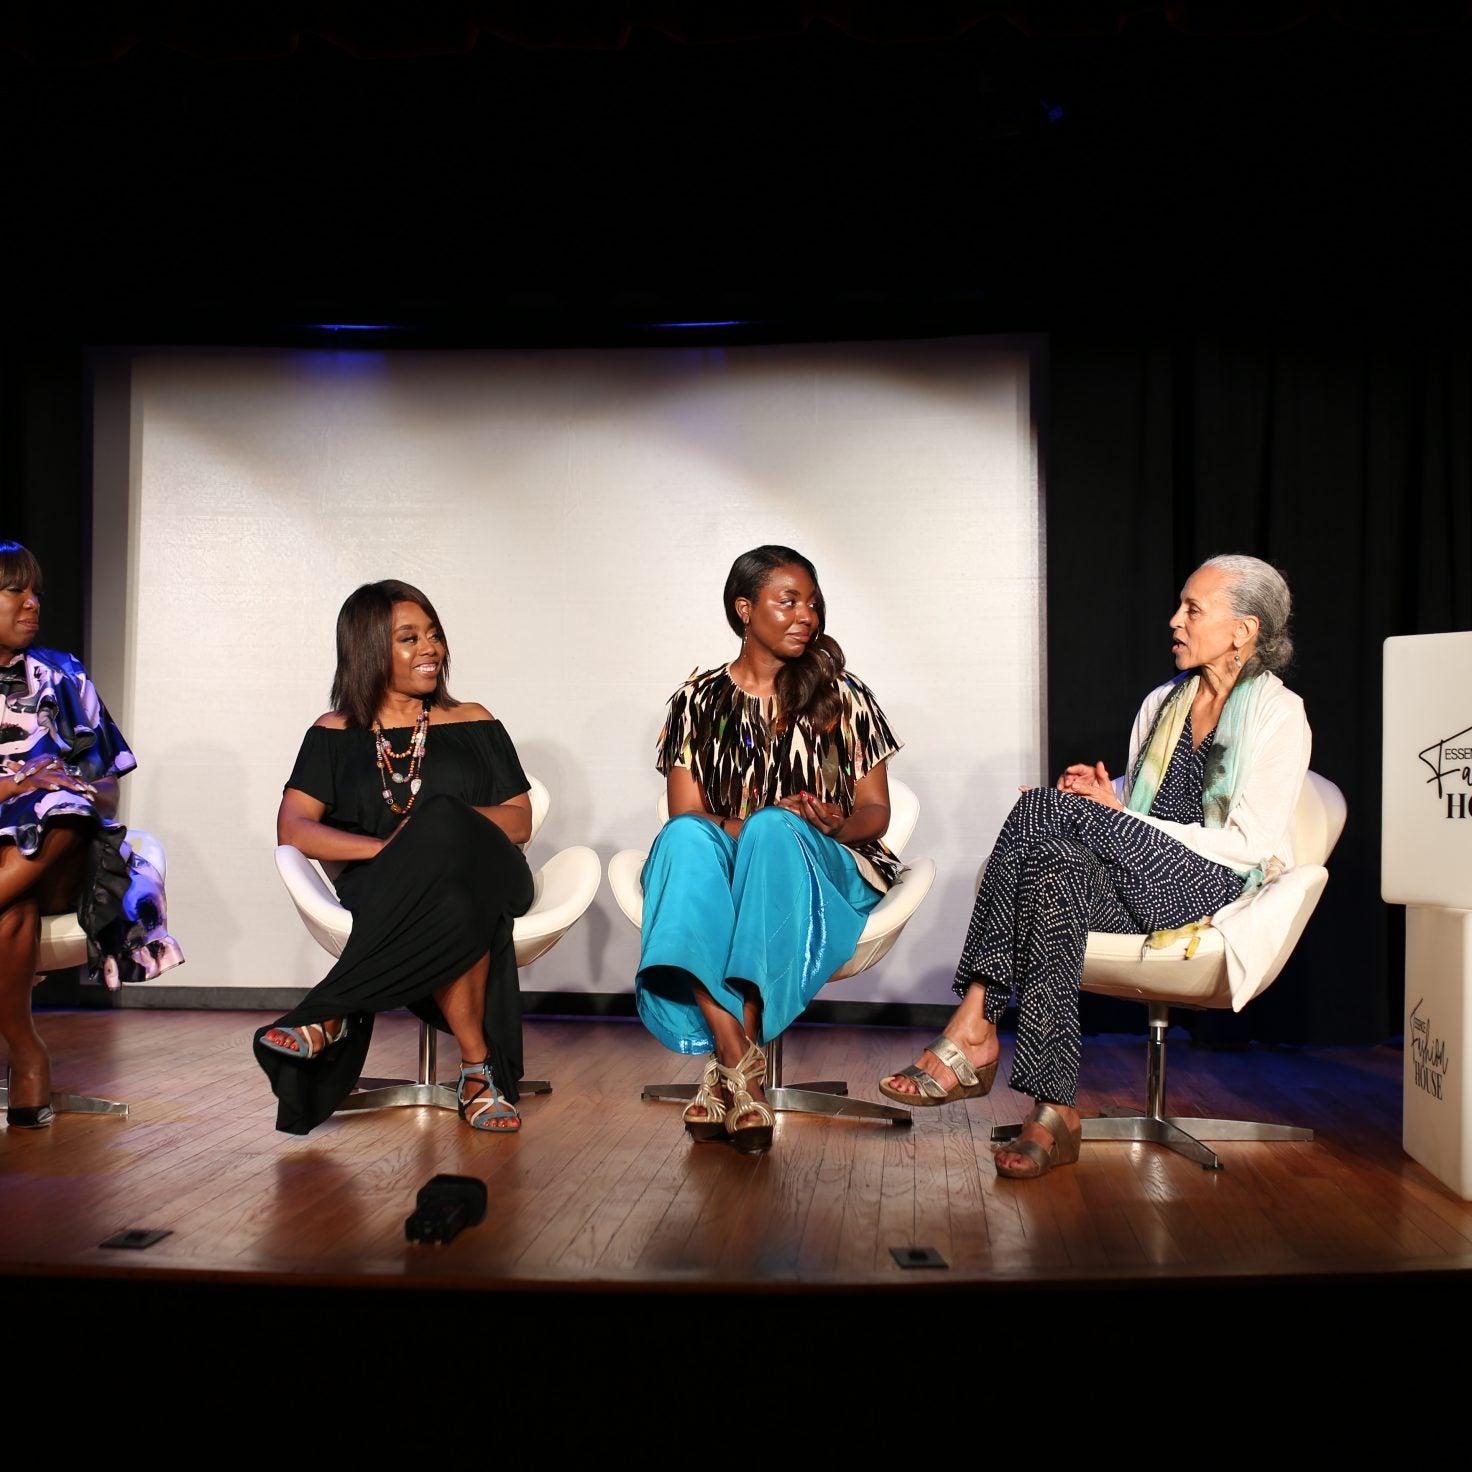 Mikki Taylor, Alva Chinn And Deborah Riley Draper On How A 1973 Fund-raiser Broke Color Barriers For Black Models